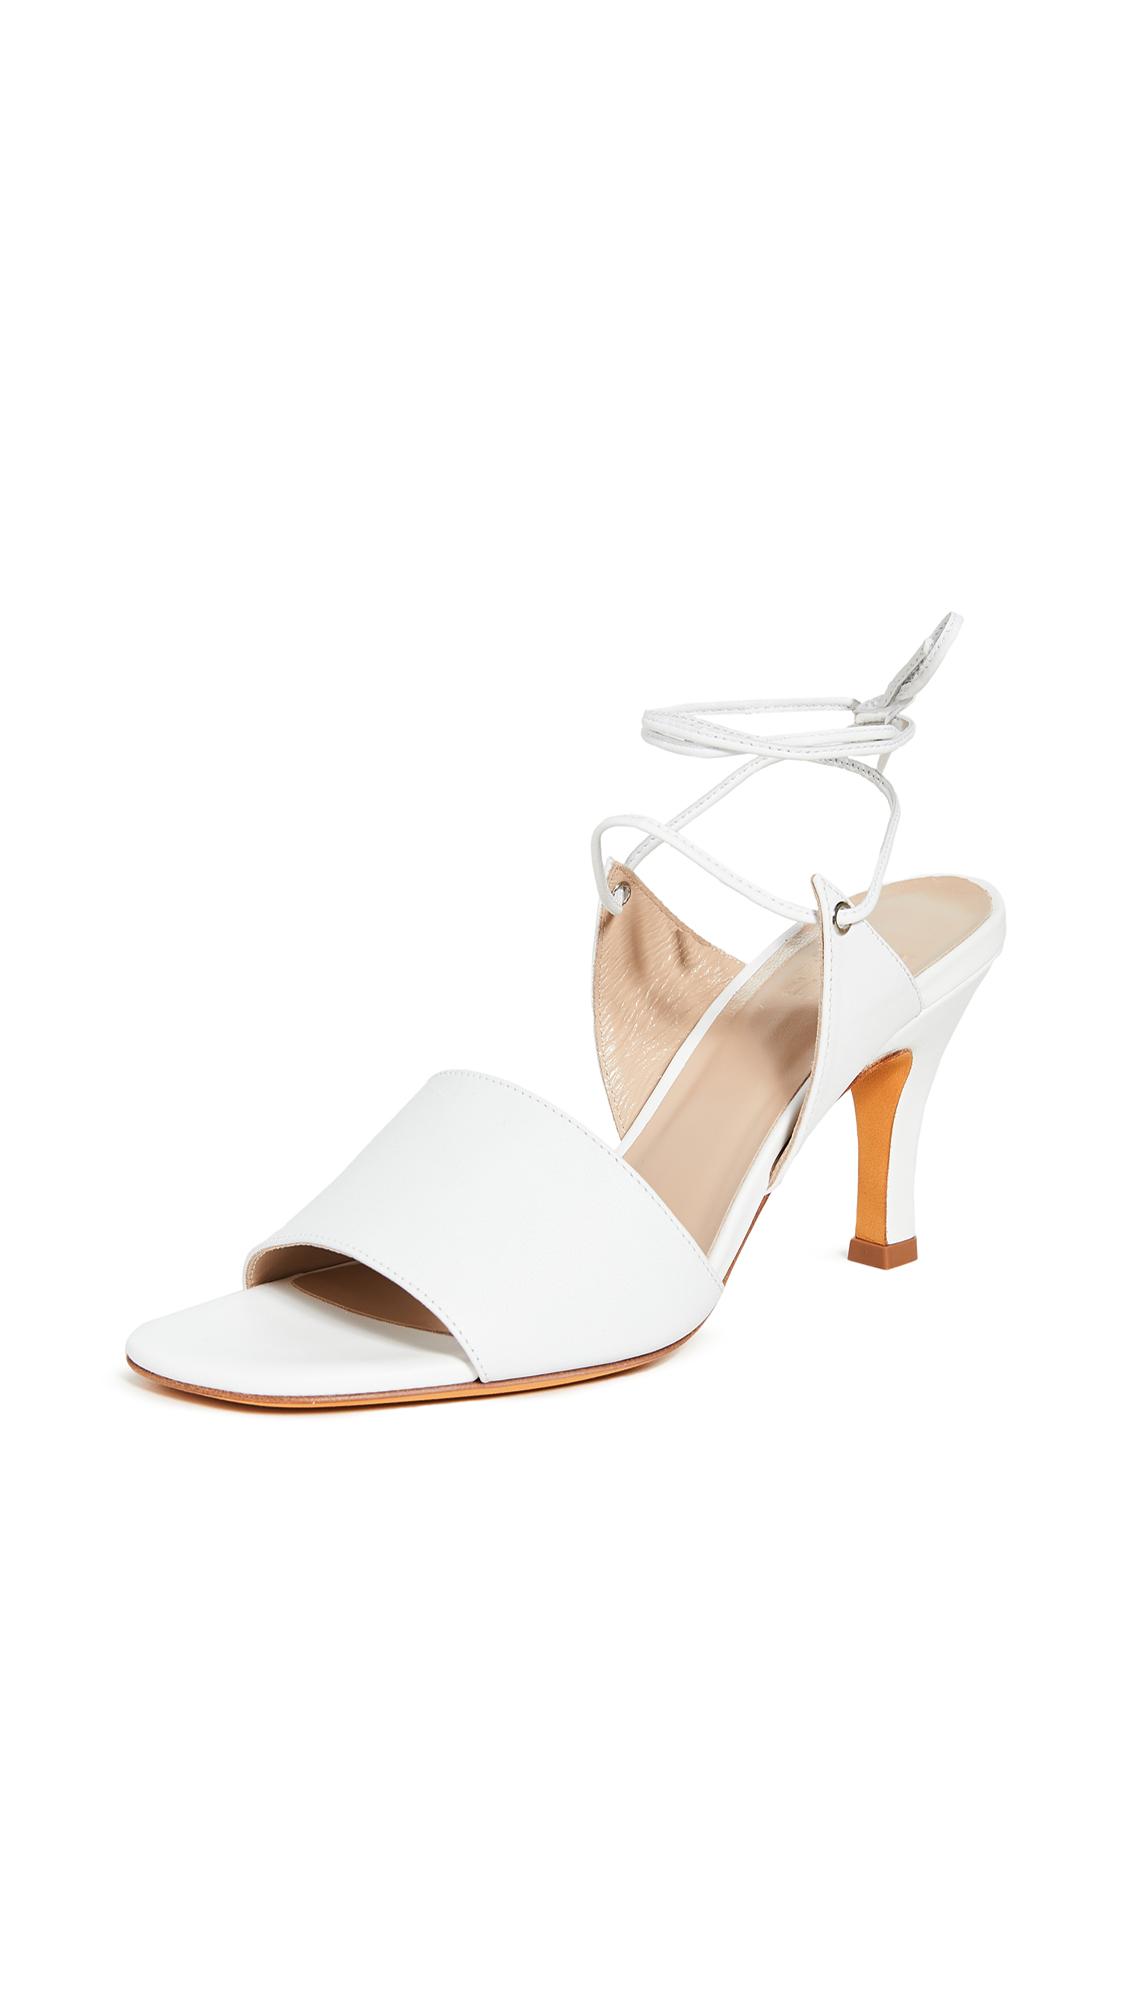 Buy Maryam Nassir Zadeh Lark Sandals online, shop Maryam Nassir Zadeh